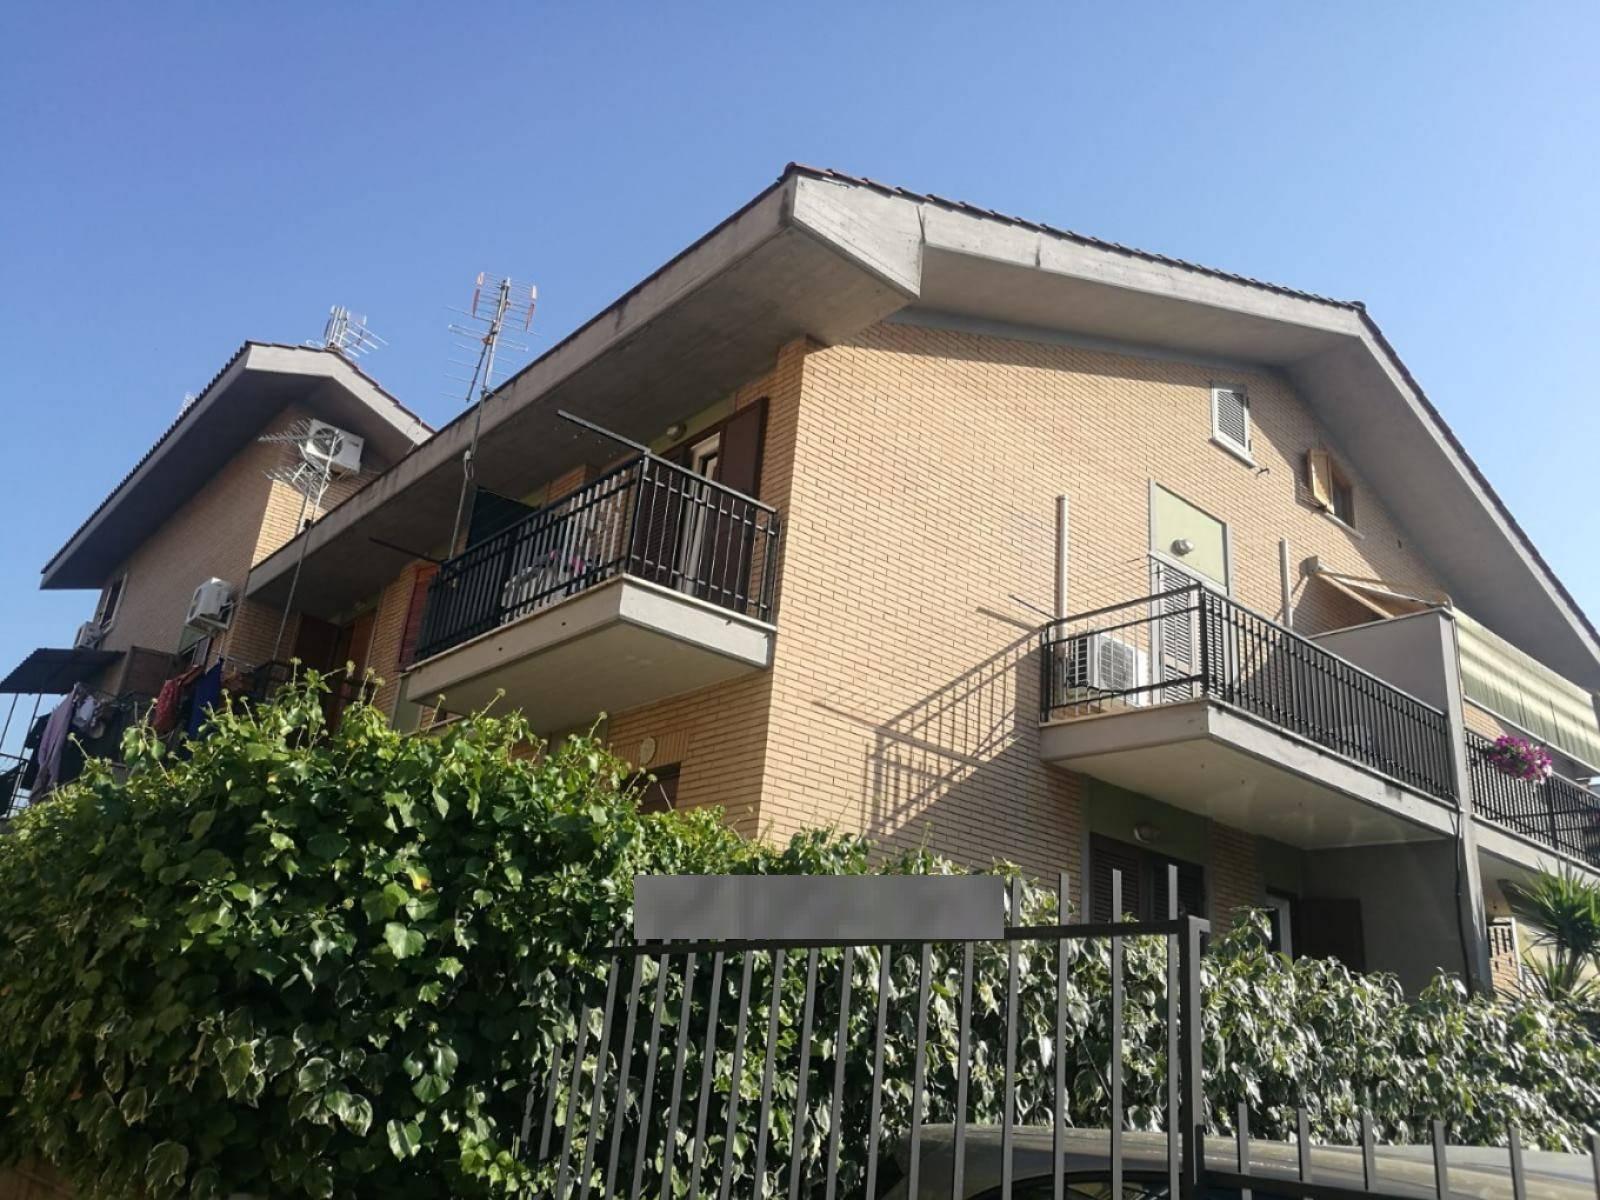 1118418373 Pentalocale in Via Martino Rota, Roma, Zona Torre Angela